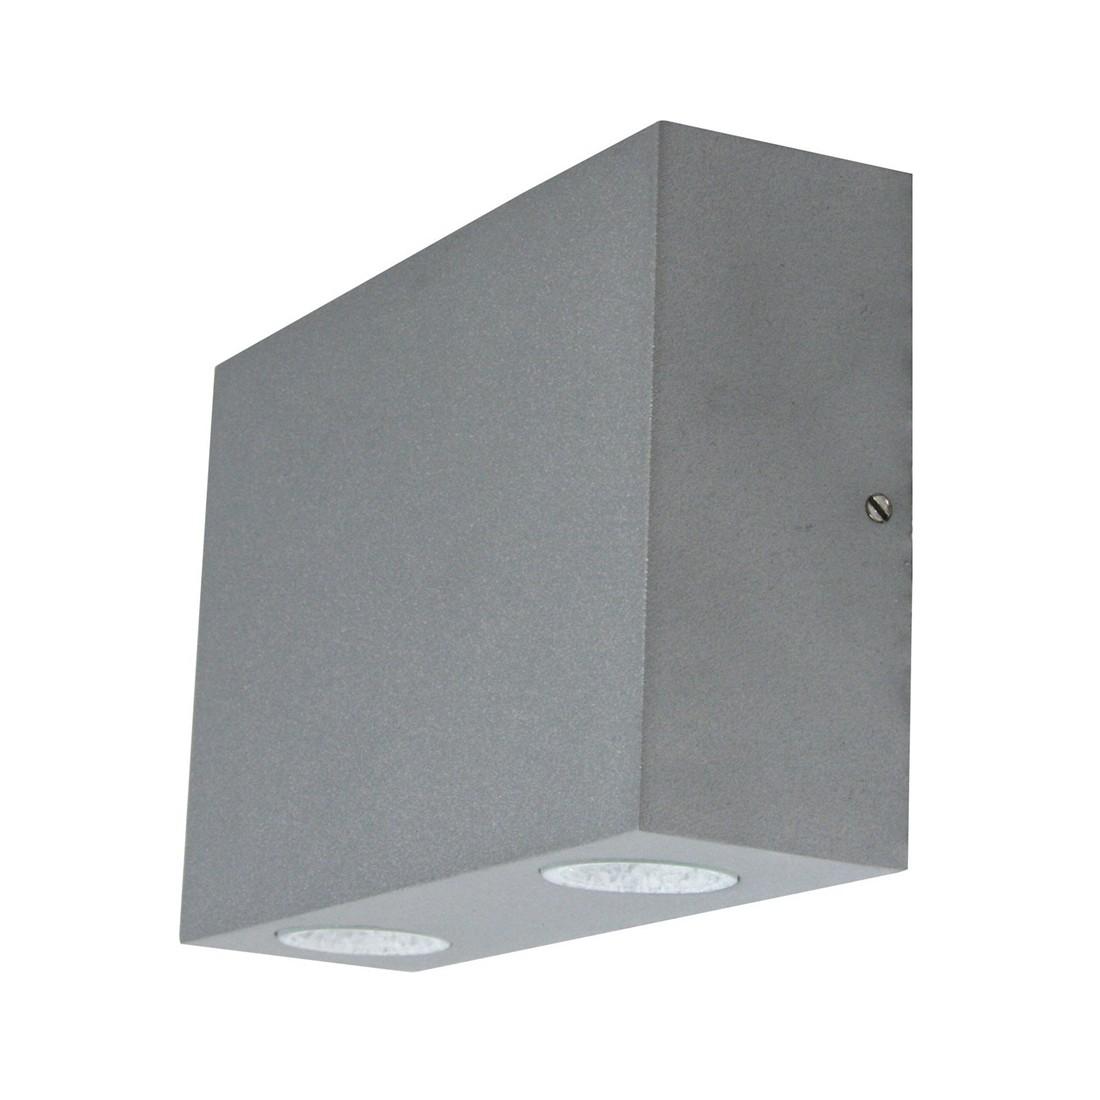 Außenleuchte Milo LED - Aluminium-Druckguss Silbergrau, Heitronic